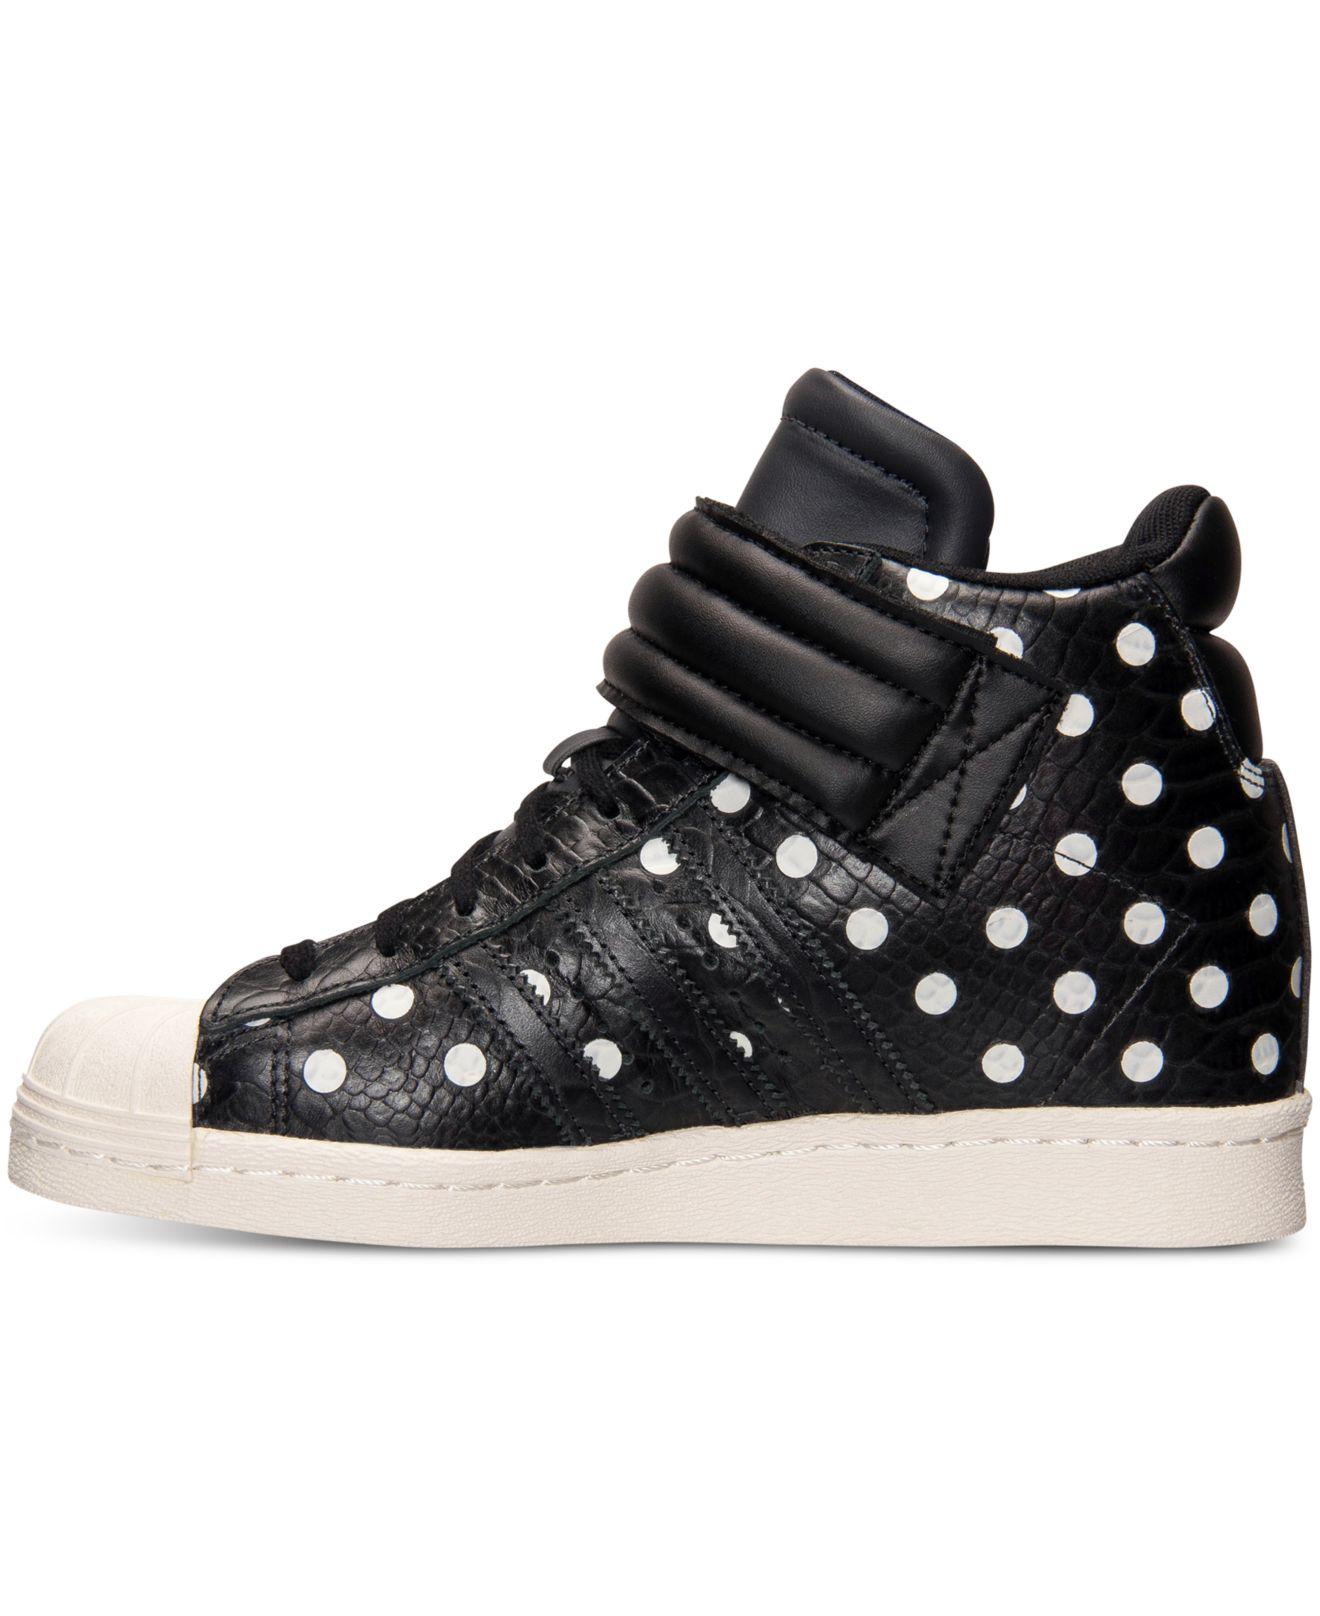 adidas superstar up strap polka dot